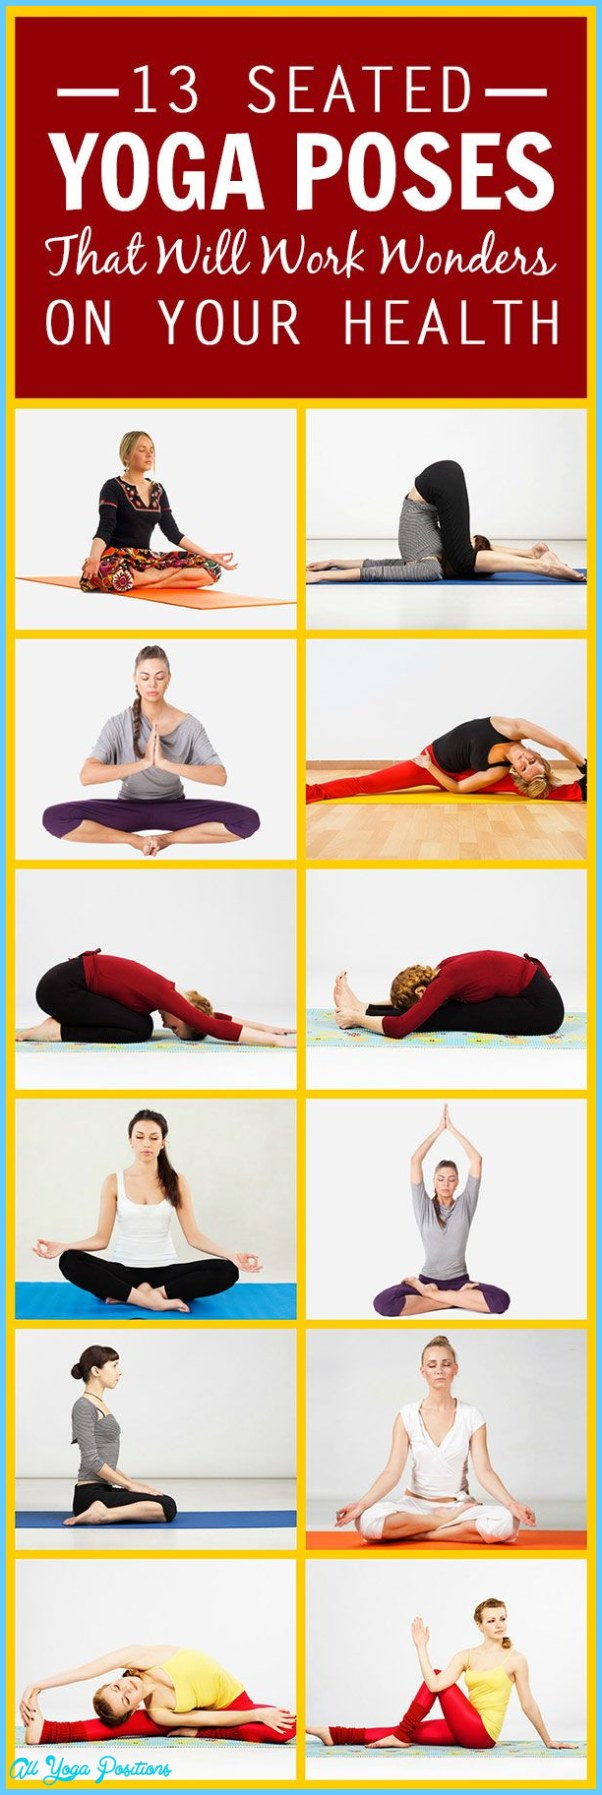 10 Simple Yoga Poses That Work Wonders for Musicians_17.jpg